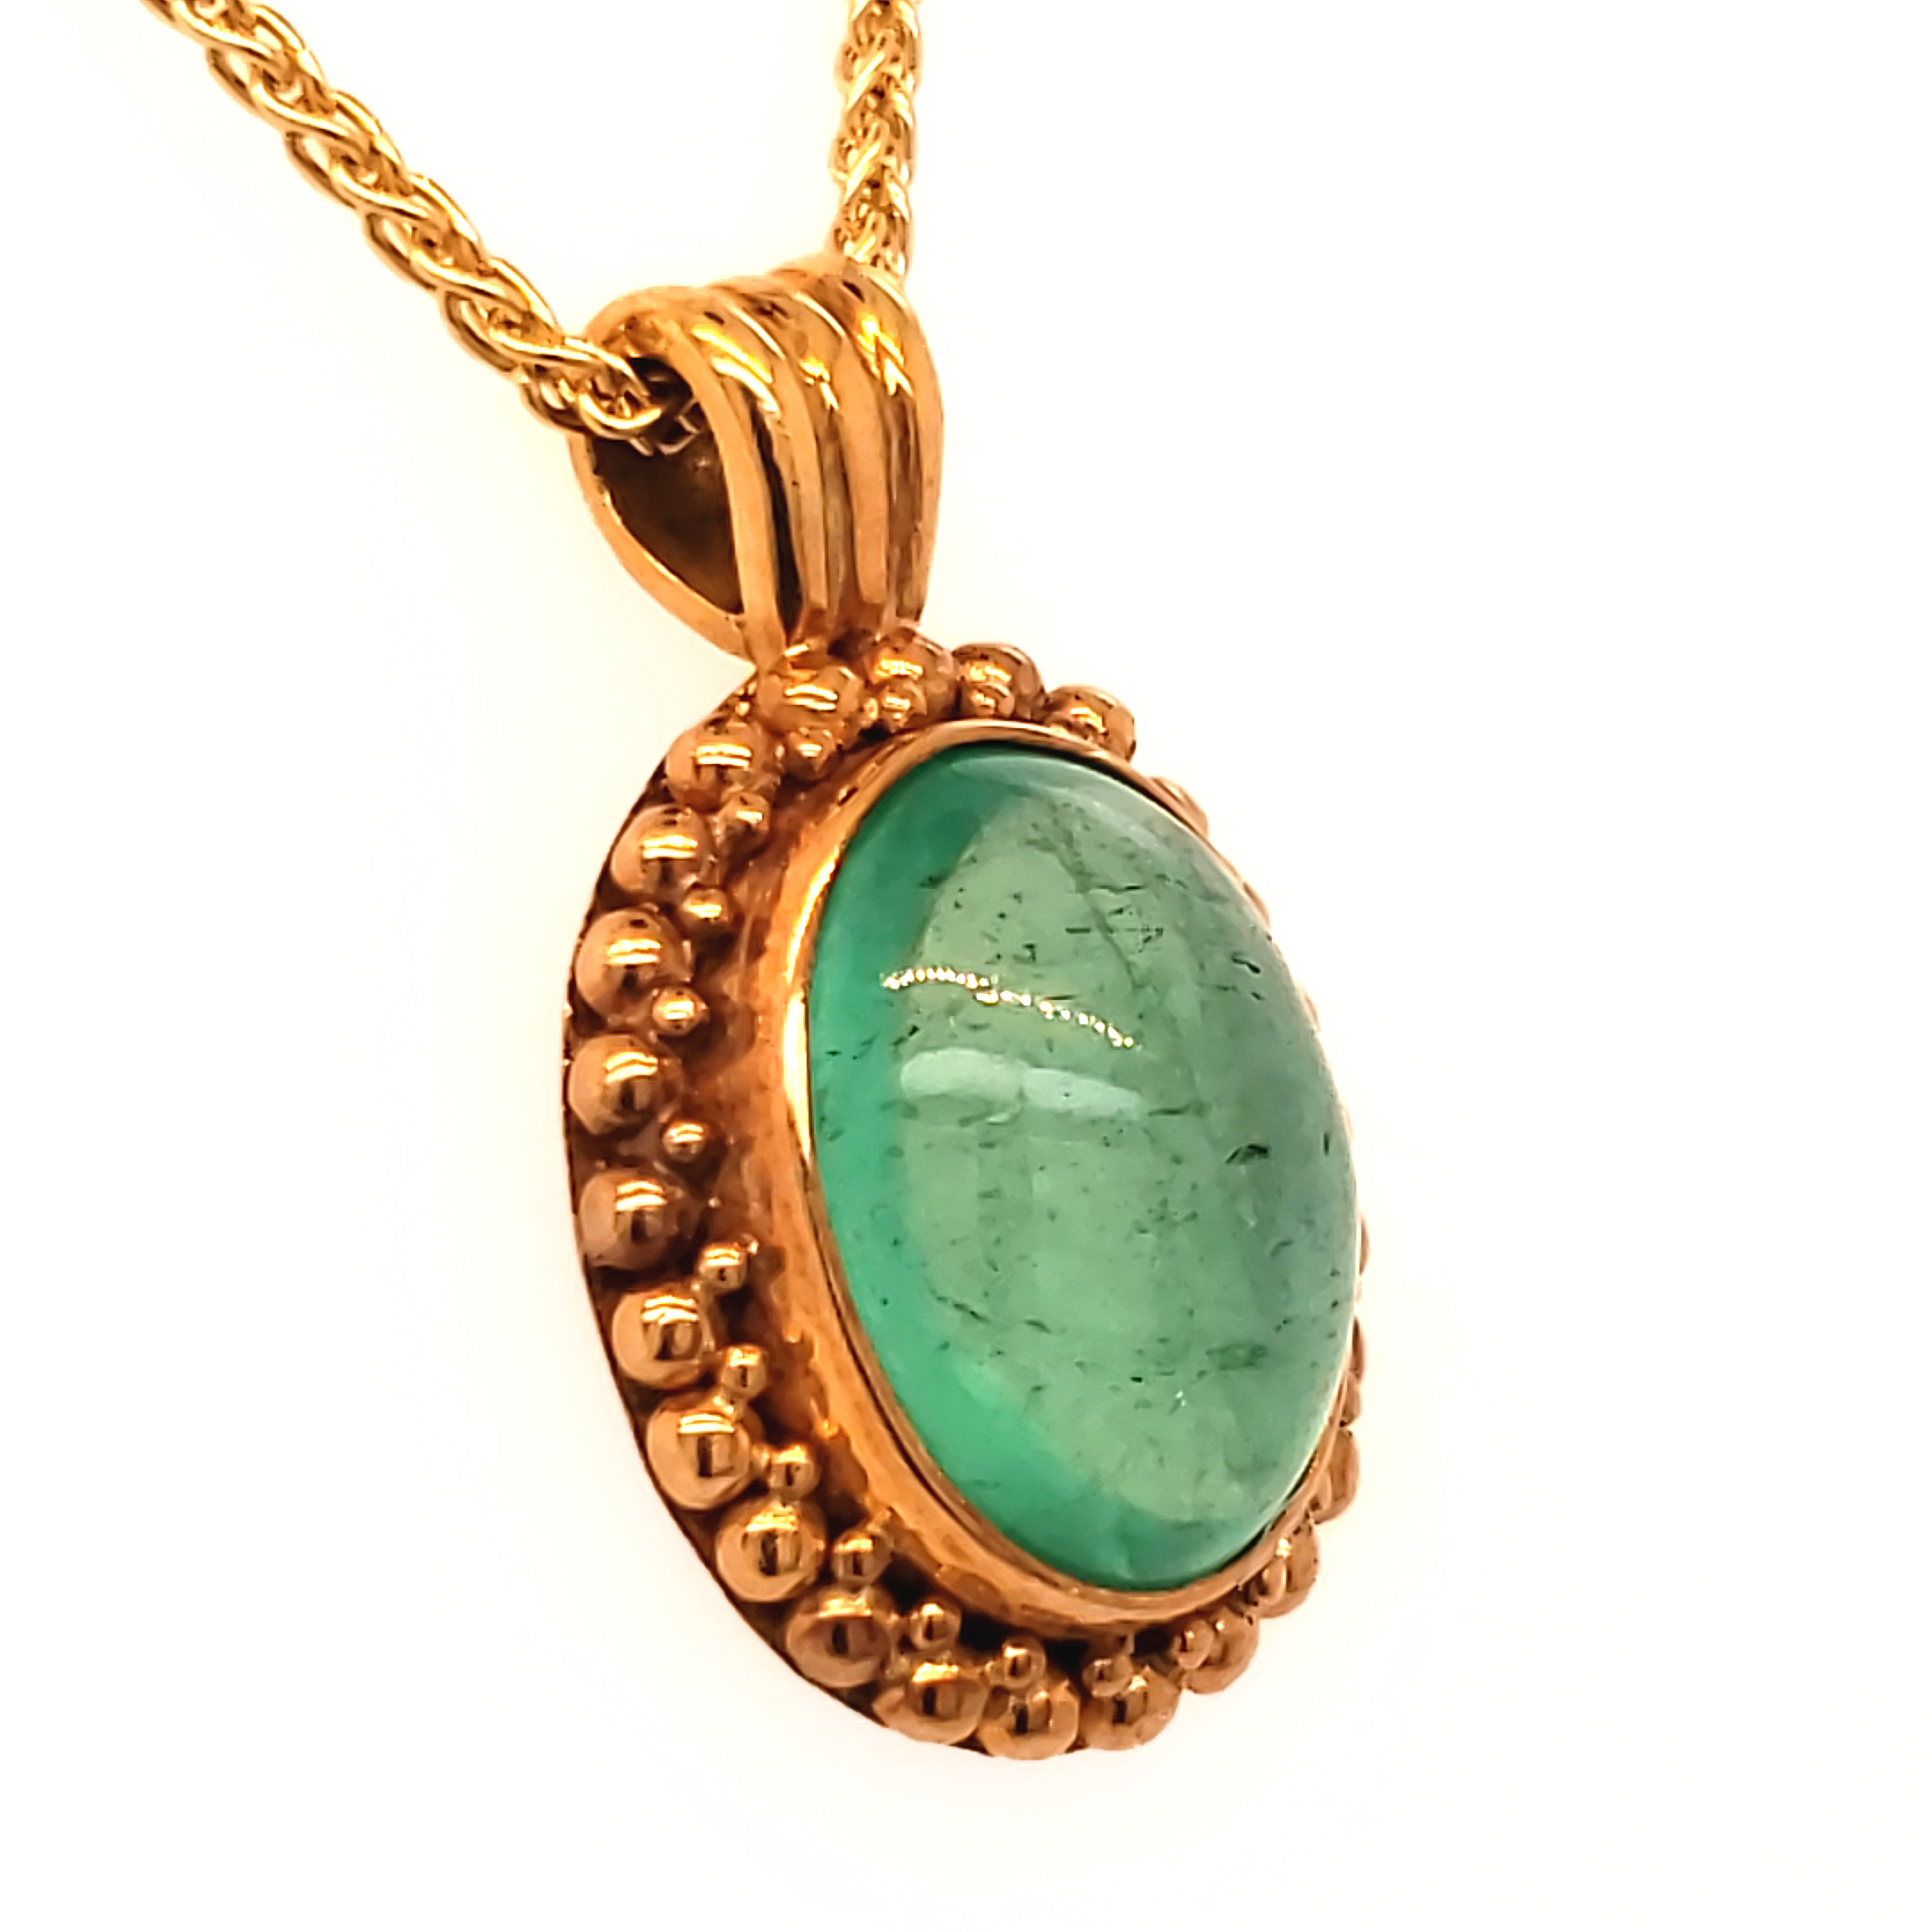 22k Emerald Cabachon Pendant